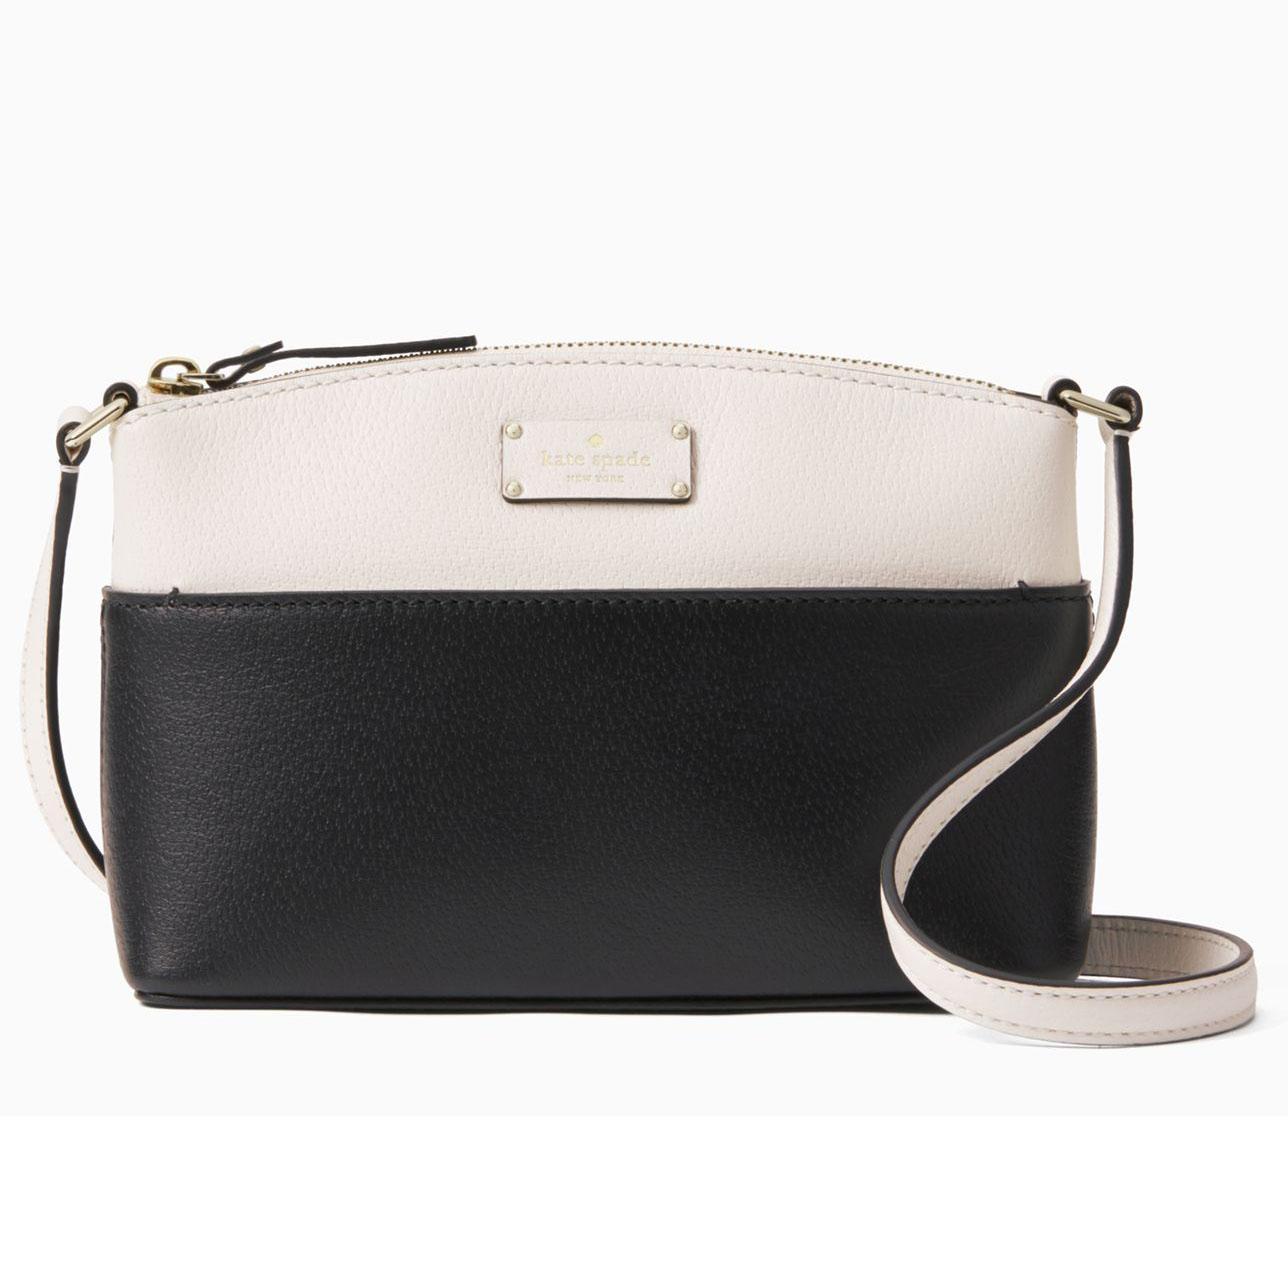 Compare Kate Spade Grove Street Millie Crossbody Bag Handbag Black Cream Wkru4194 Gift Receipt Prices